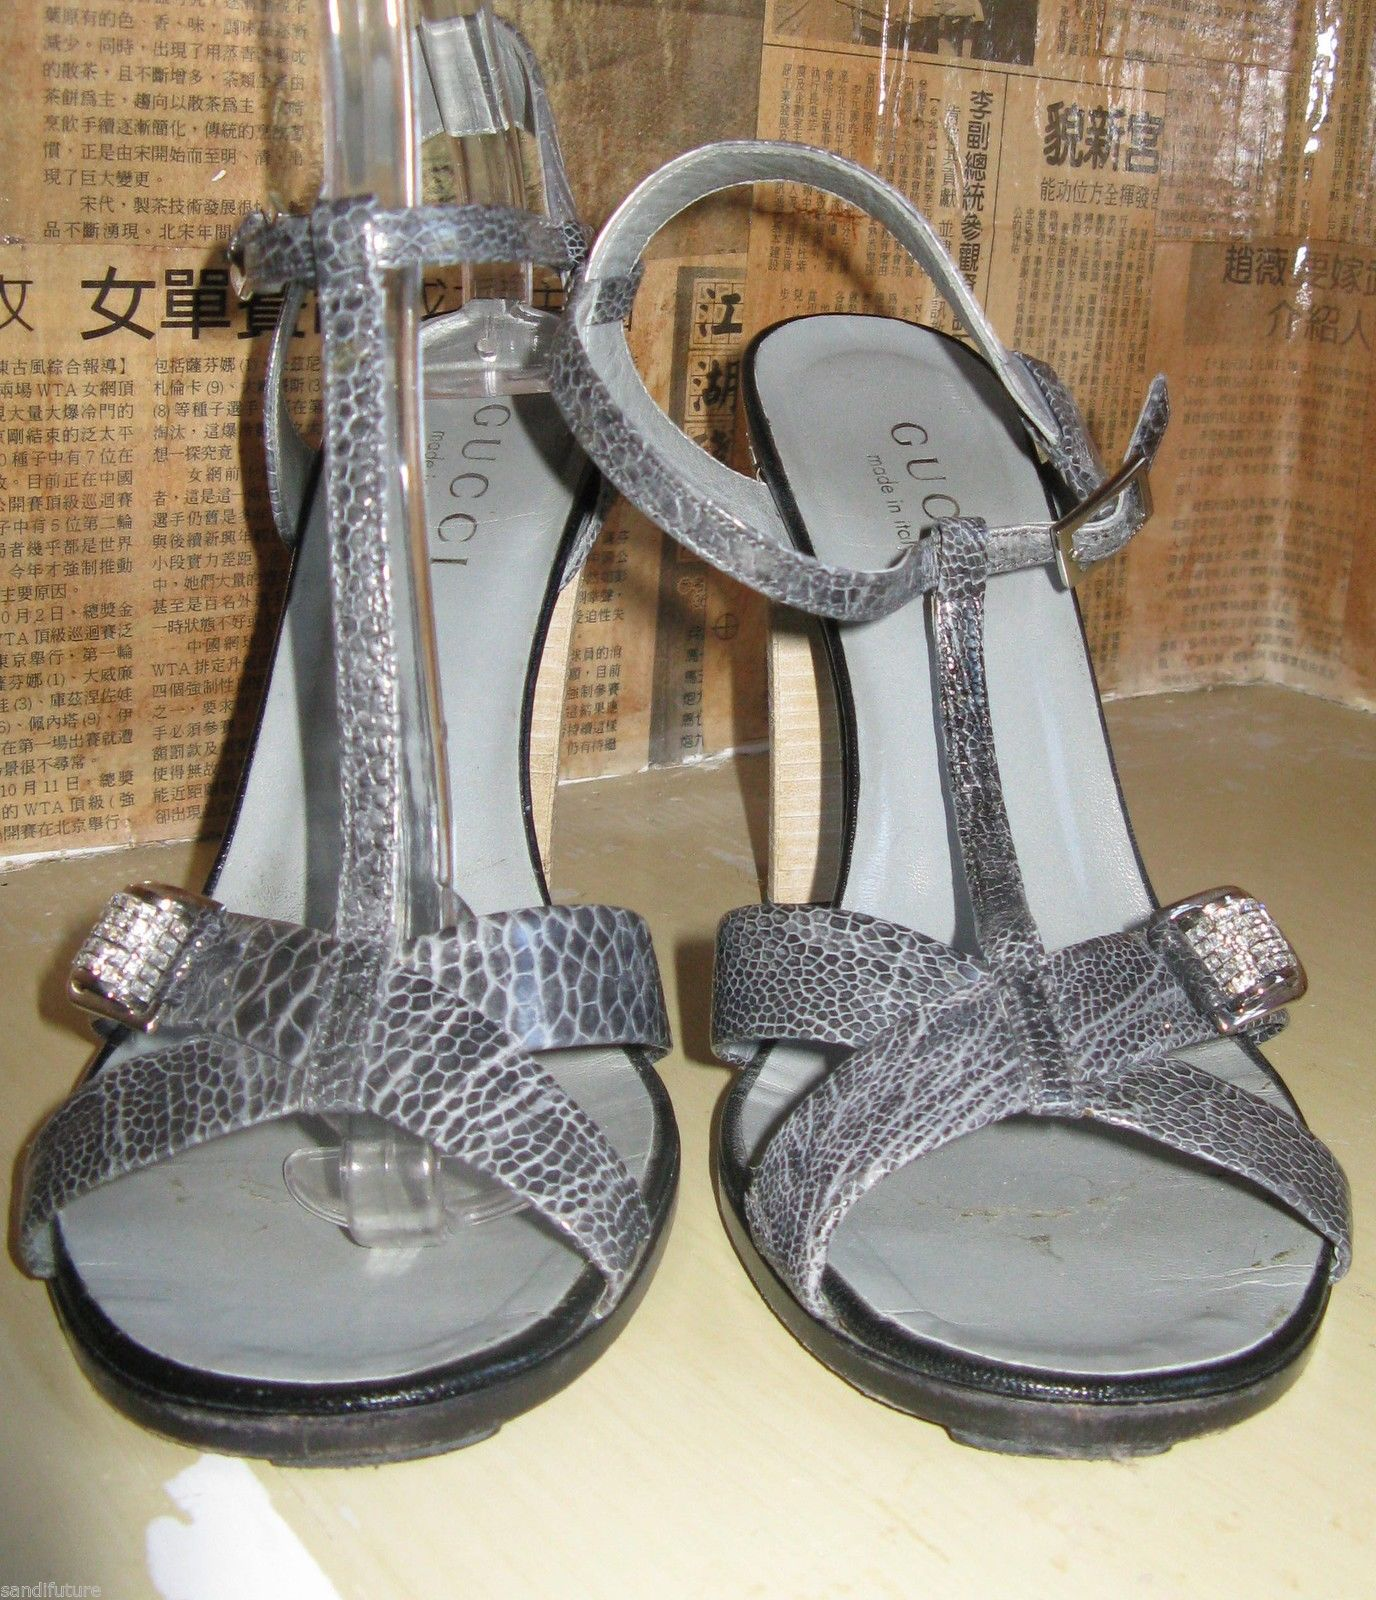 Gucci reptile snake rhinestones crystals bling sandals shoes heels 6.5 UK4 36.5 image 4